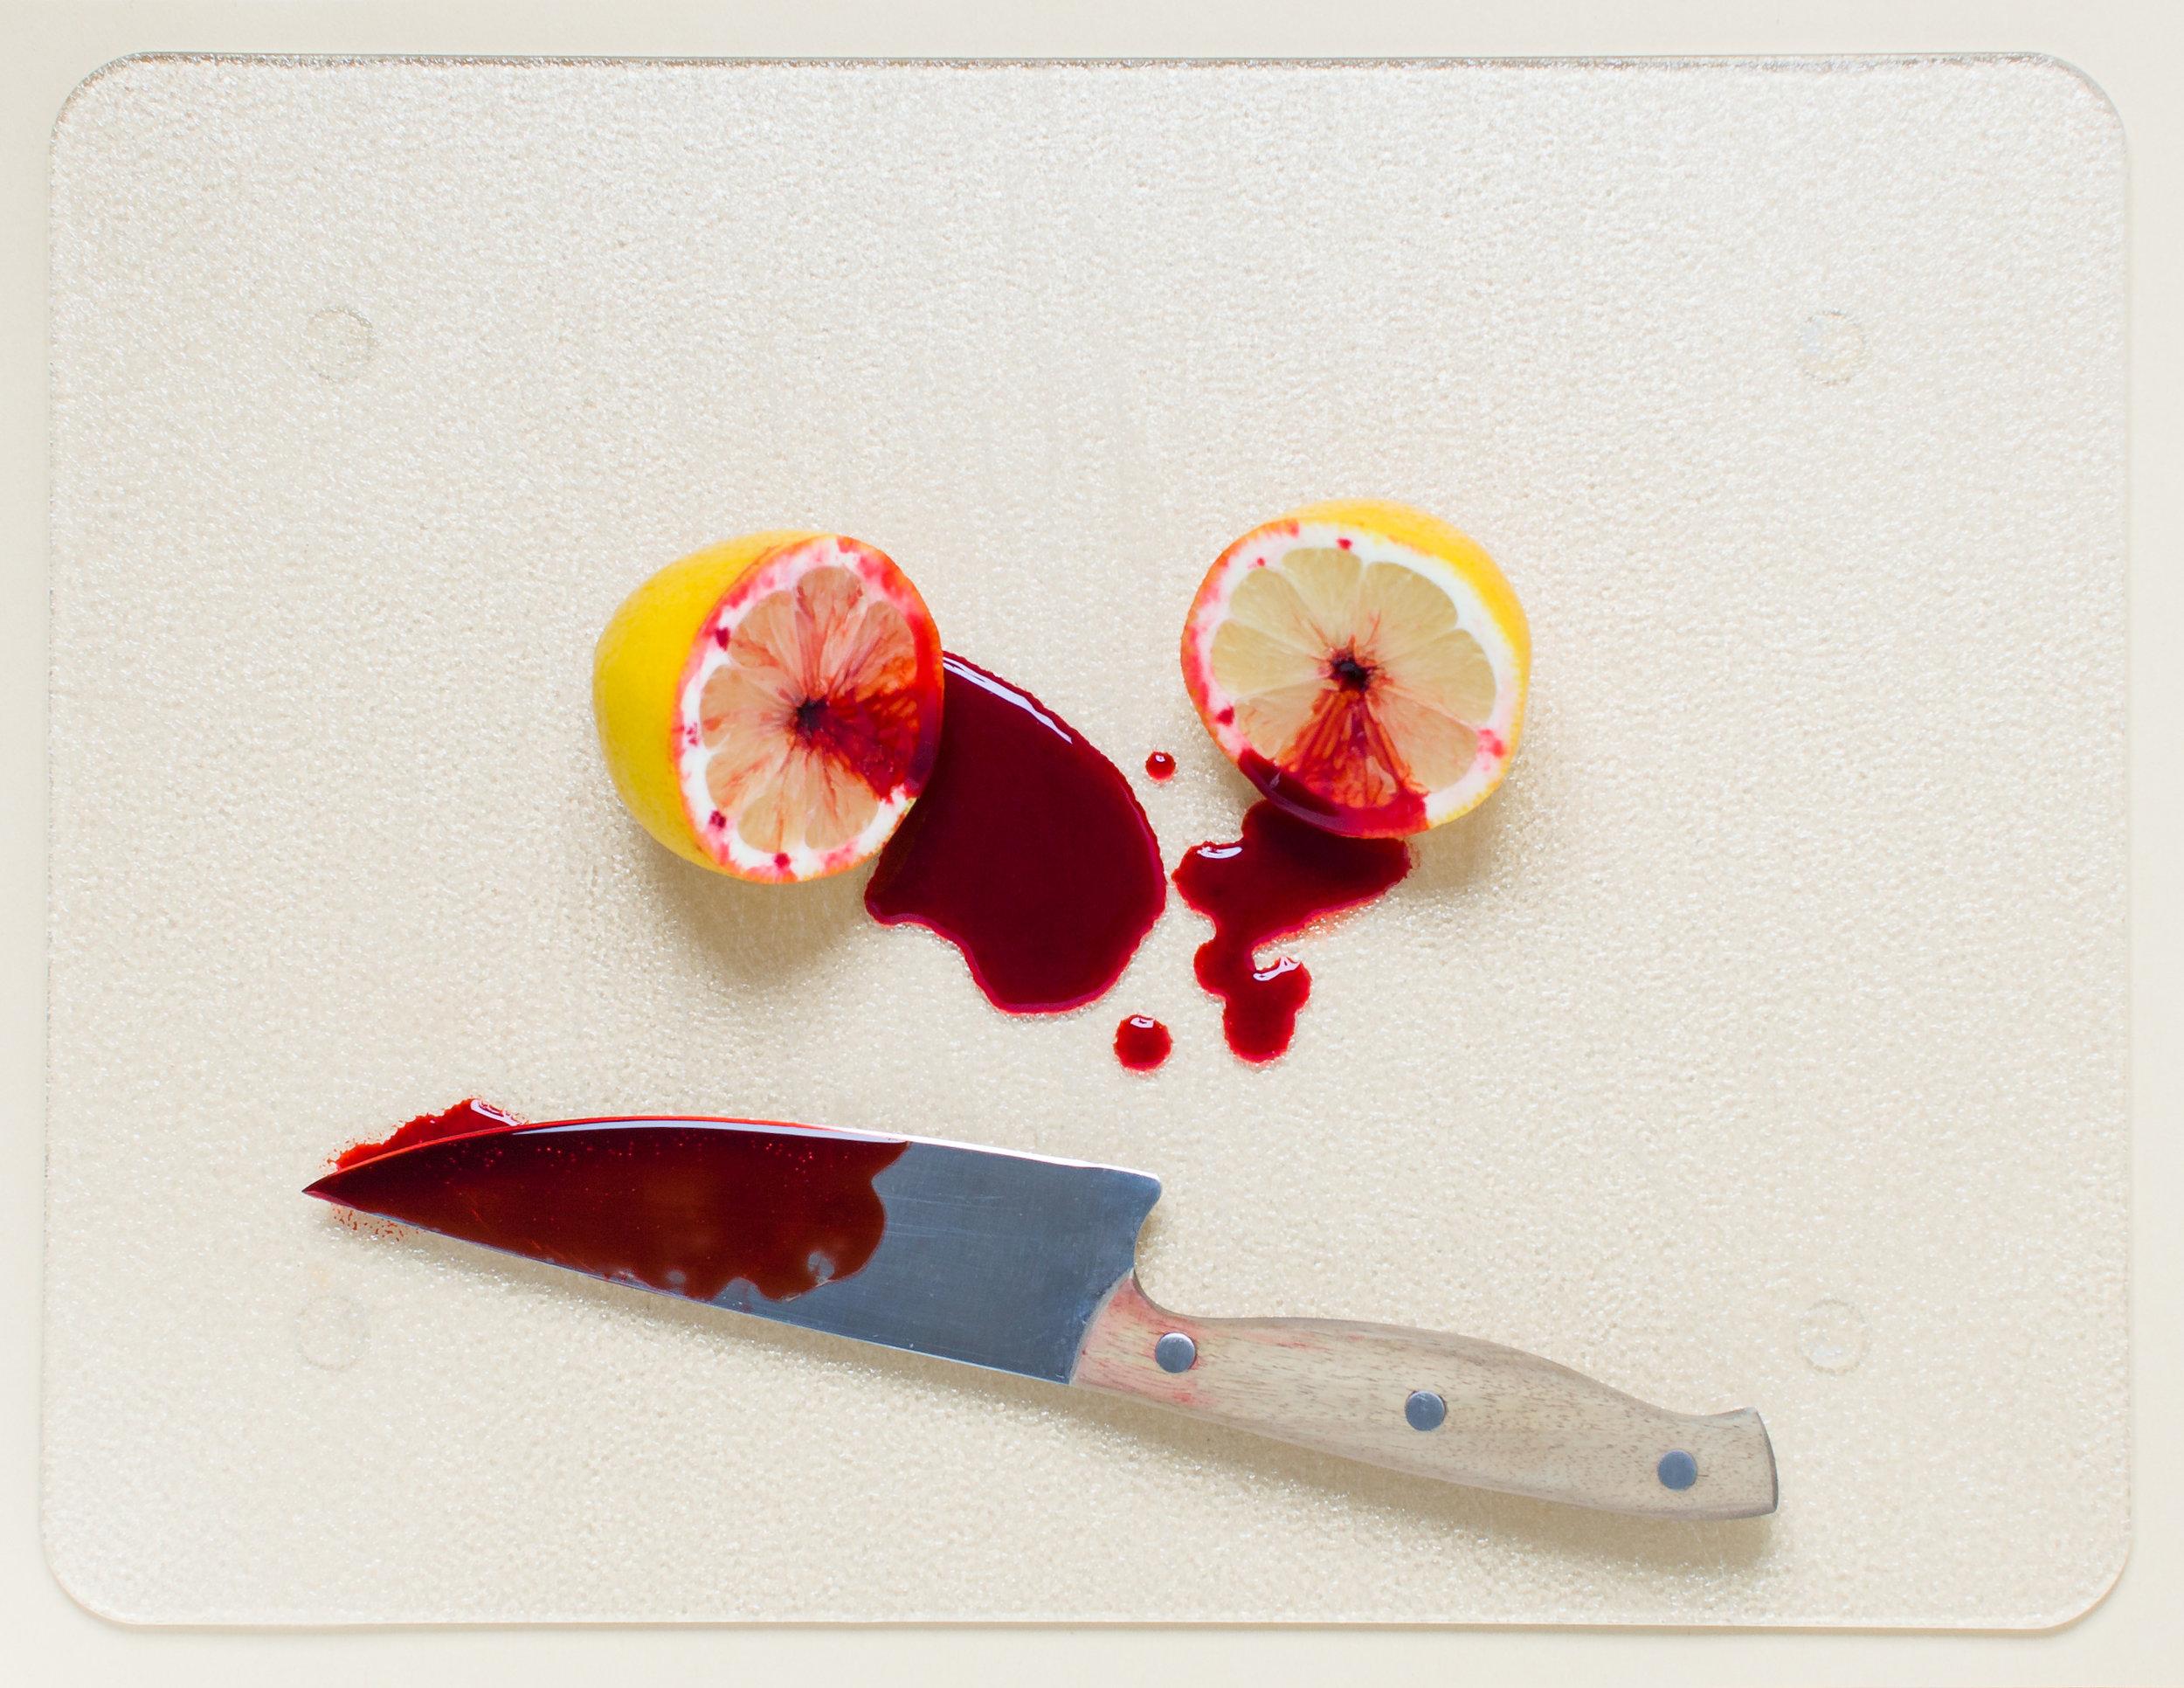 fruits-041.jpg